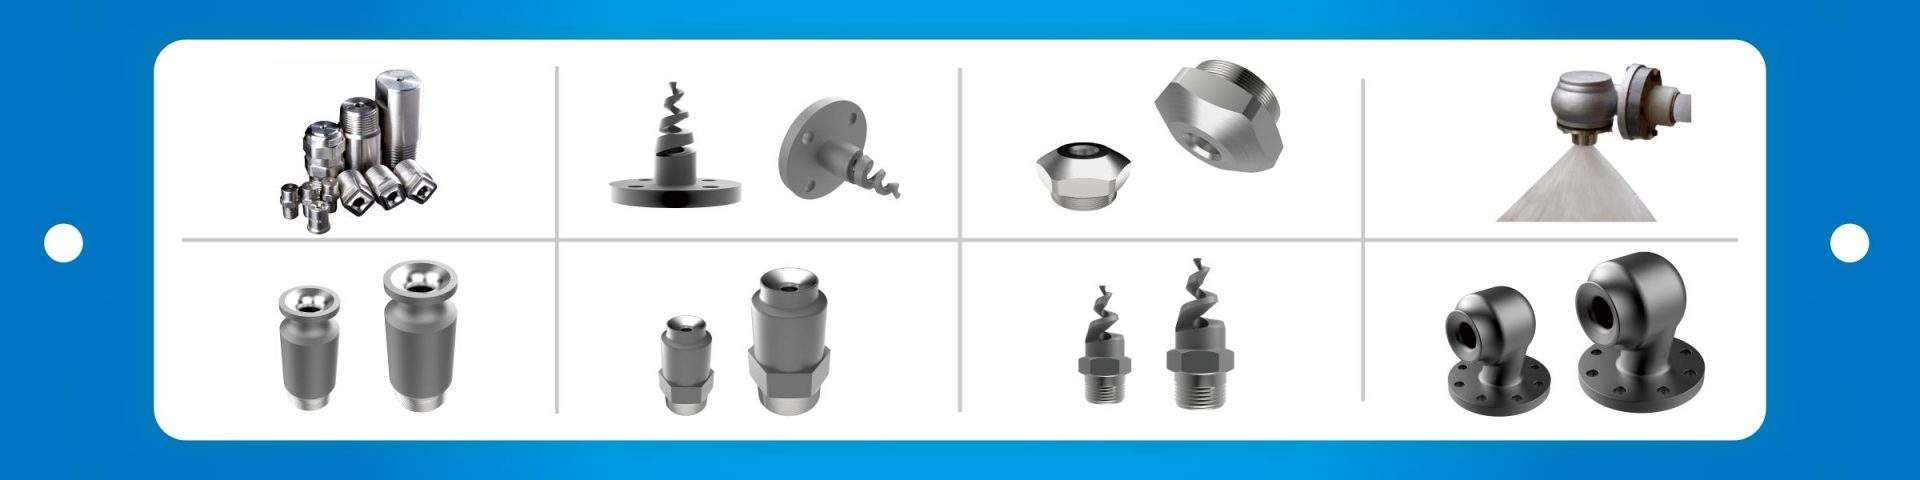 2-inch-spray-nozzle-collections